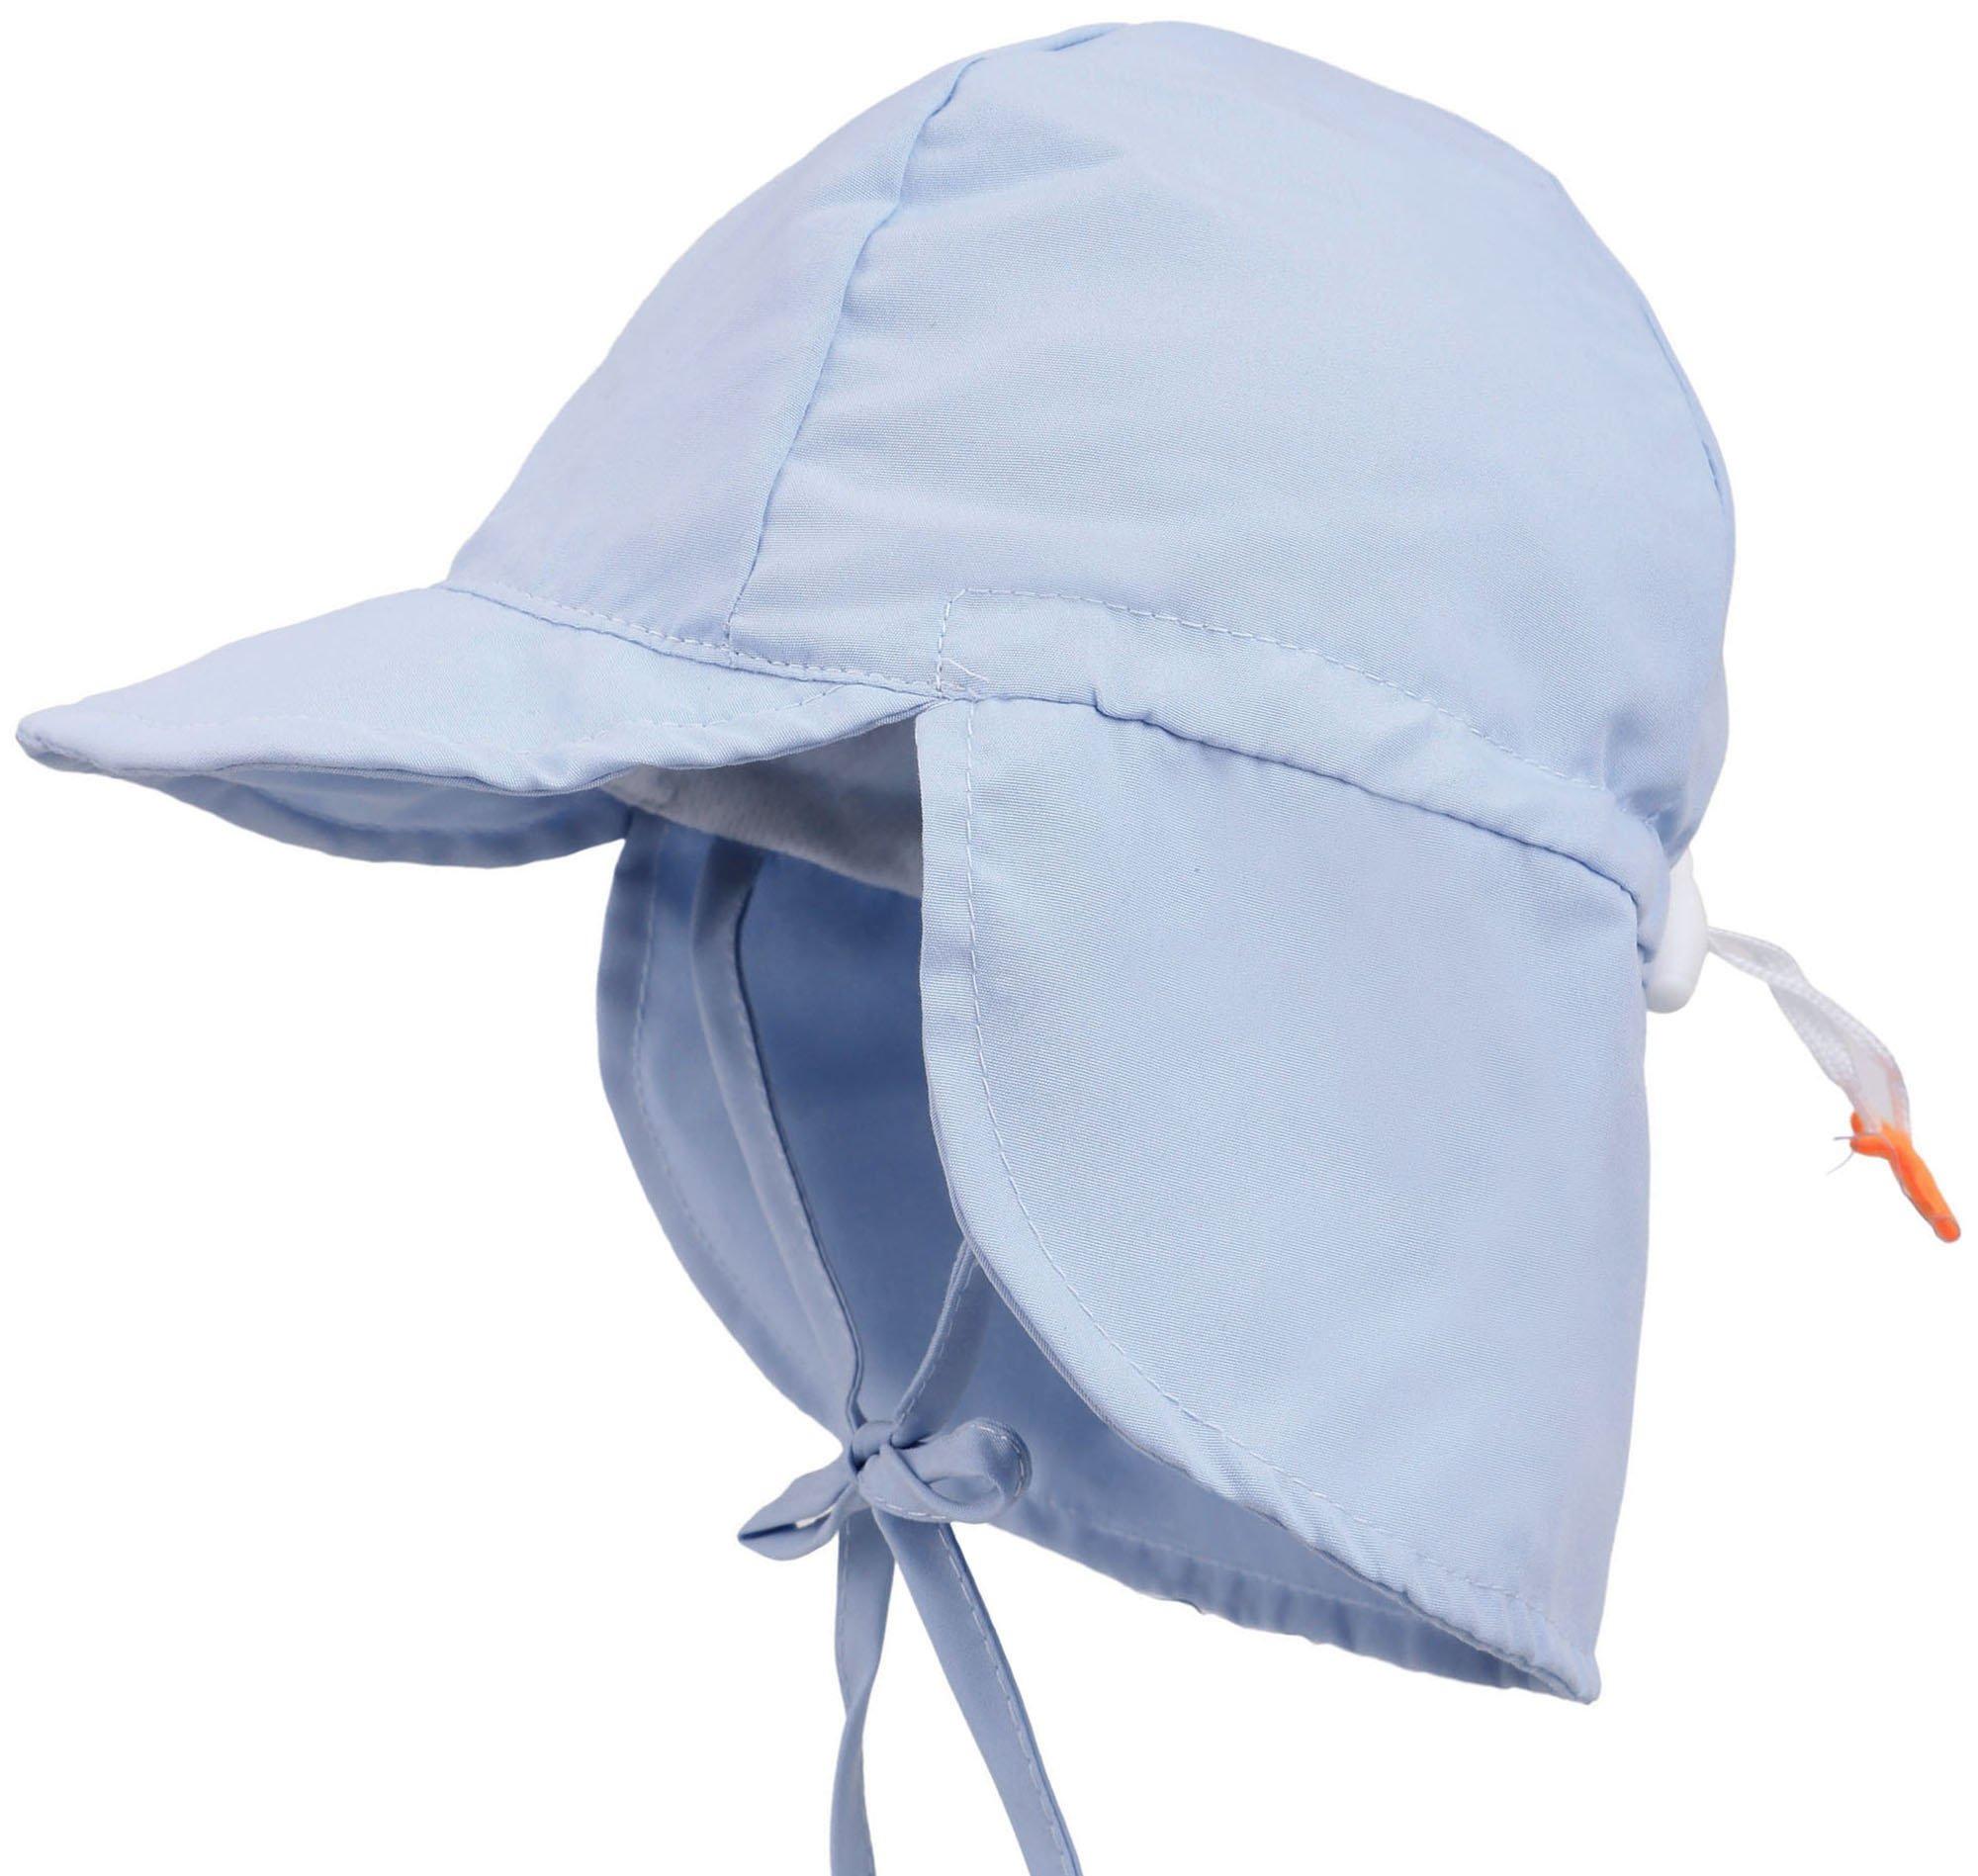 Livingston Kid's SPF 50+ UV Sun Ray Protective Safari Hat w/ Neck Cover, Blue